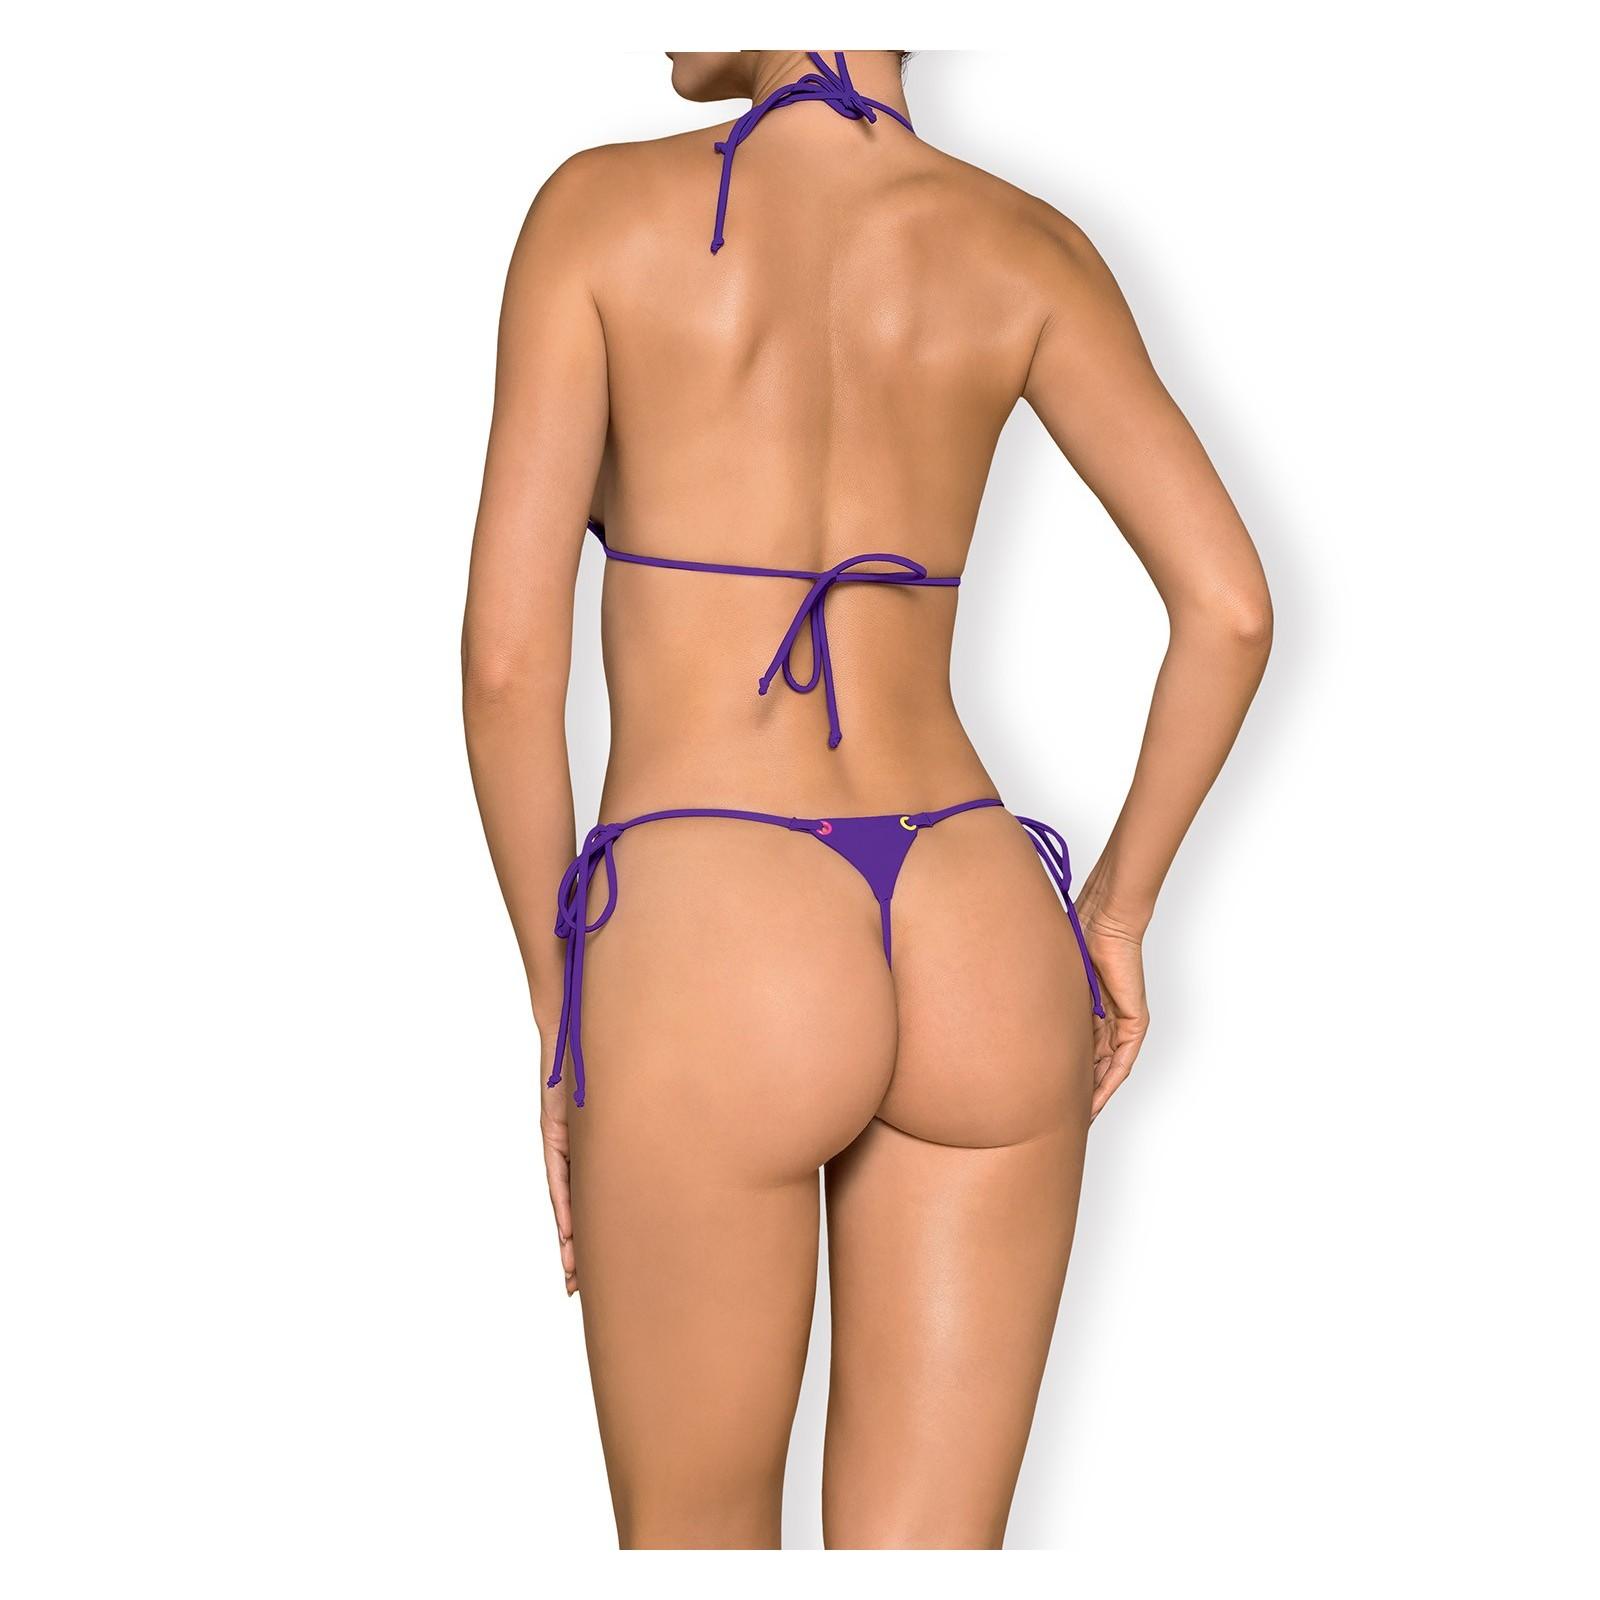 Micro-Bikini Beverelle violett - 4 - Vorschaubild